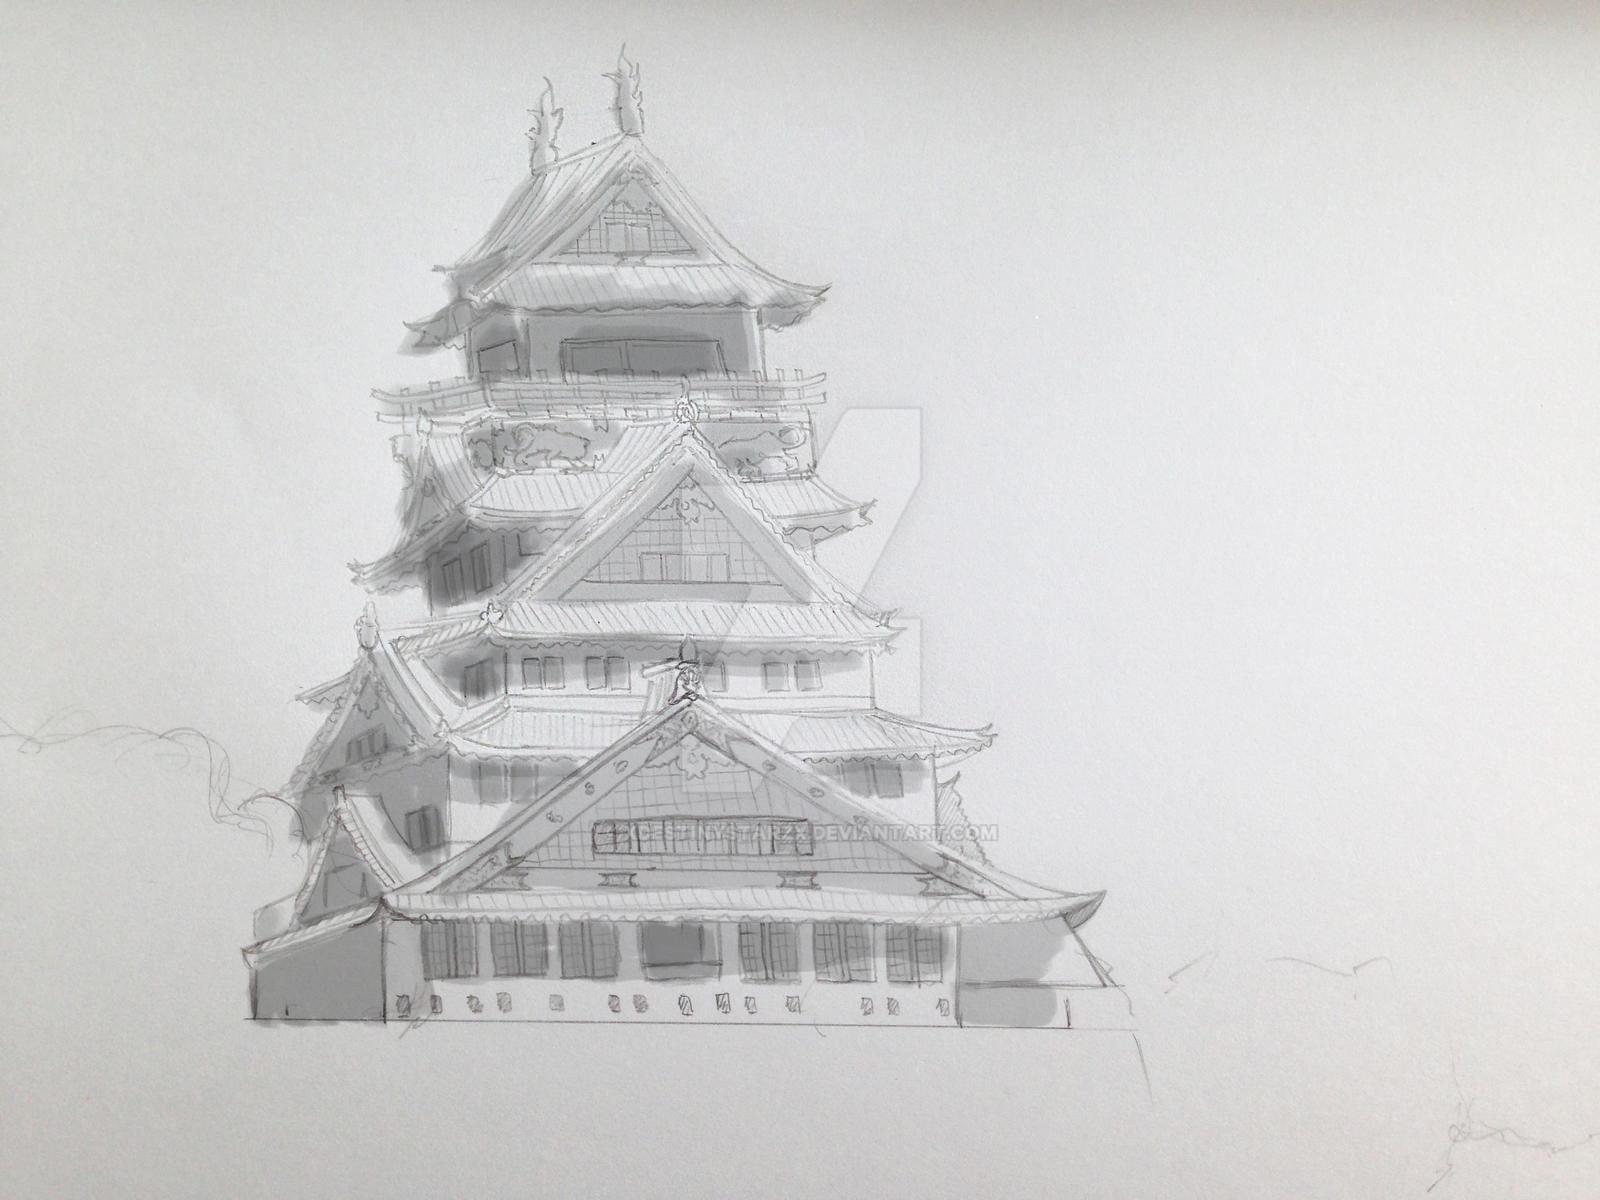 Osaka castle shading by xdestinystarzx osaka castle shading by xdestinystarzx